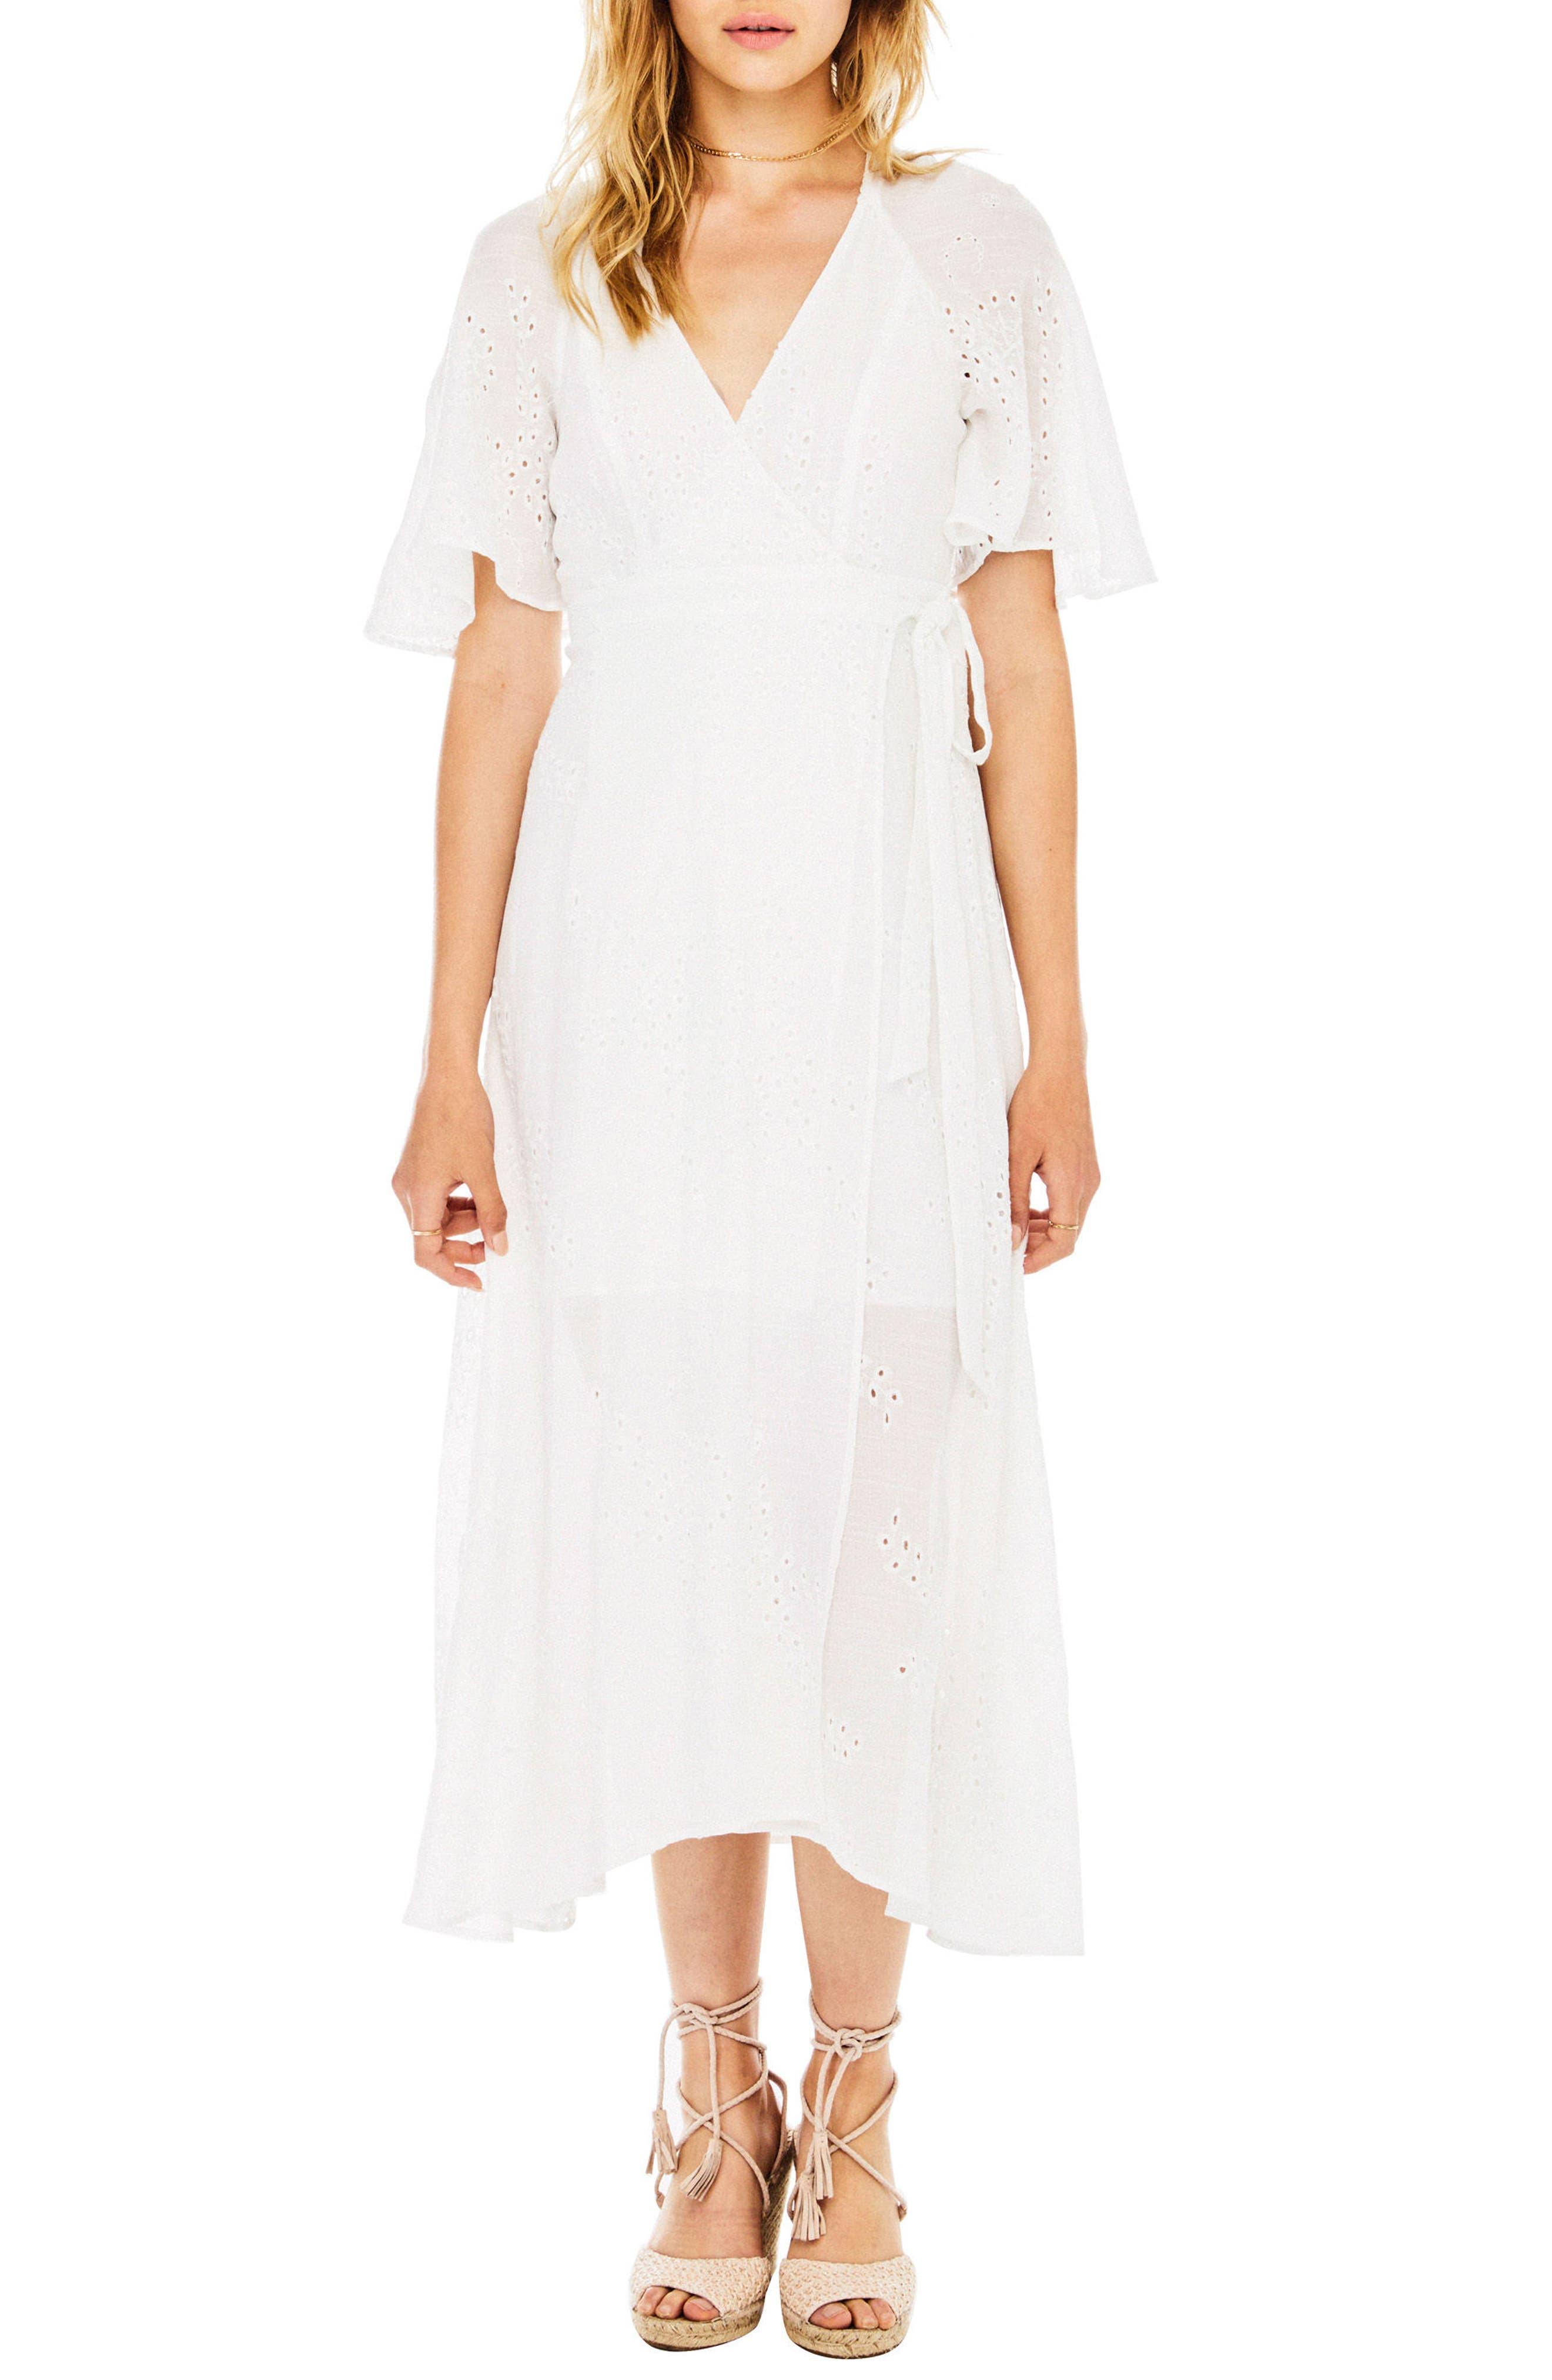 Gretchen Eyelet Wrap Dress,                             Main thumbnail 1, color,                             100